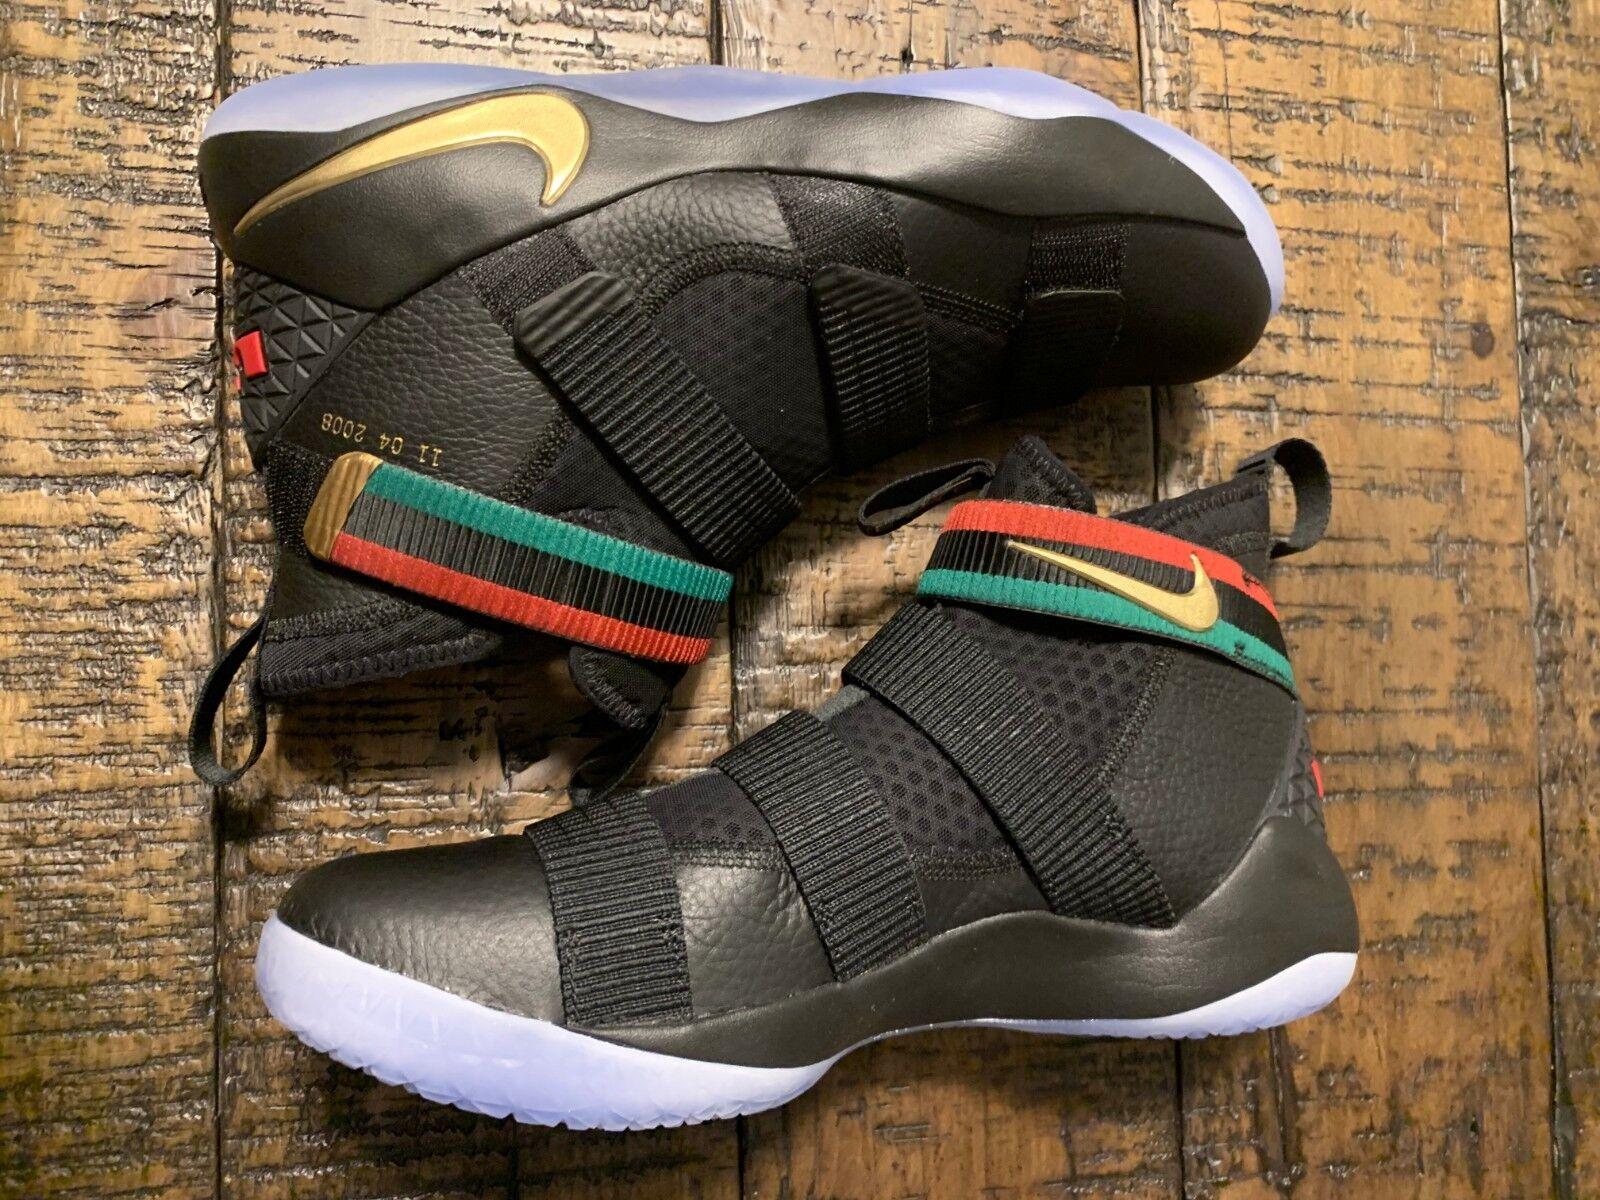 Nike Lebron James Soldier XI Promo BHM AQ9578 001 SZ 13 NO BOX TOP